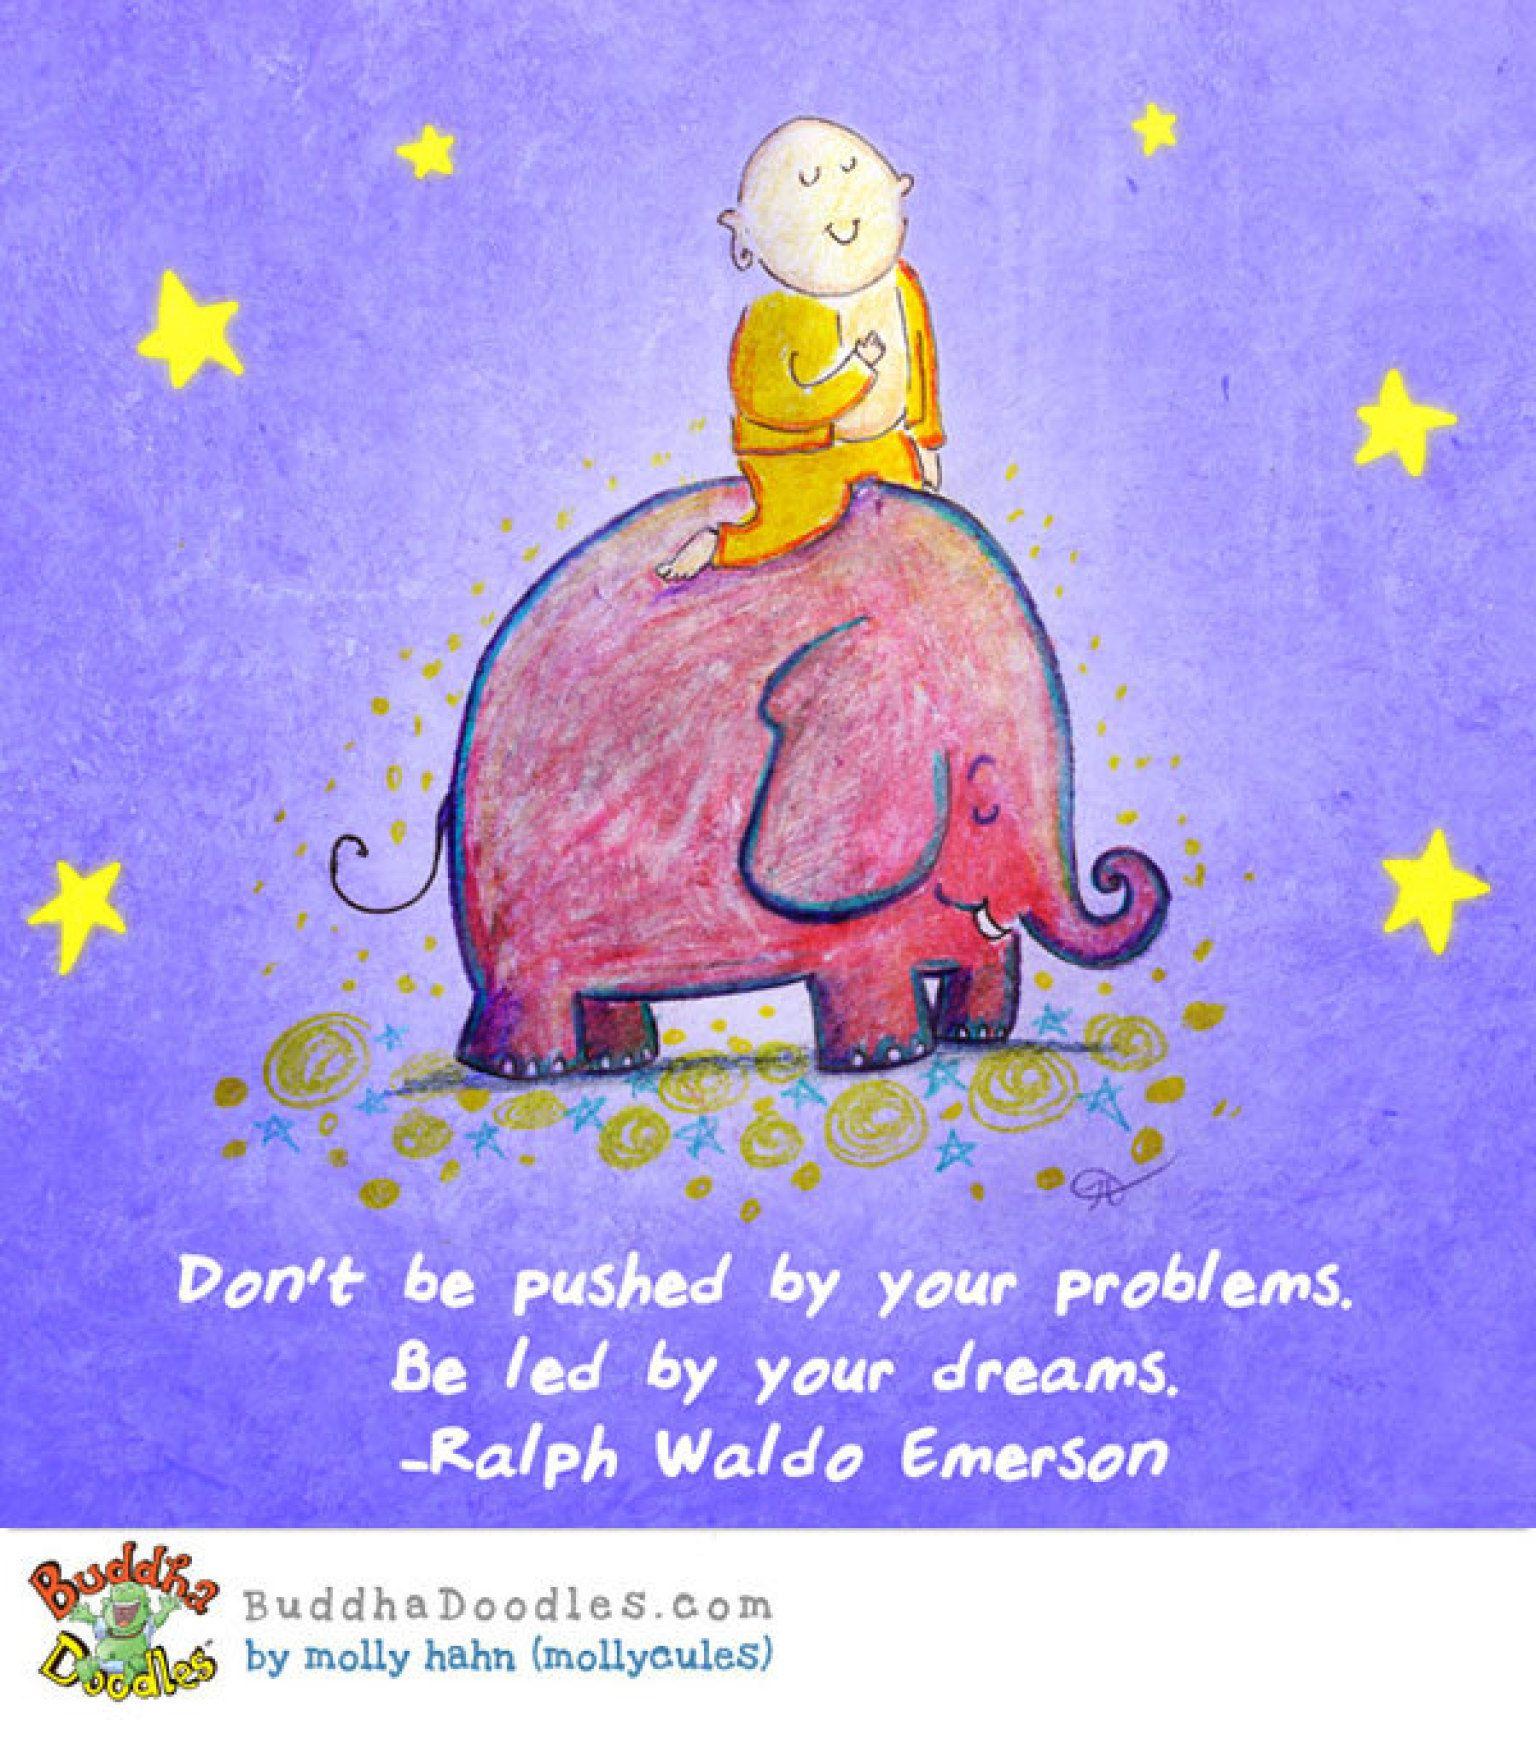 DREAM BIG [today's buddha doodle] | Buddha doodle, Buddah doodles, Buddha